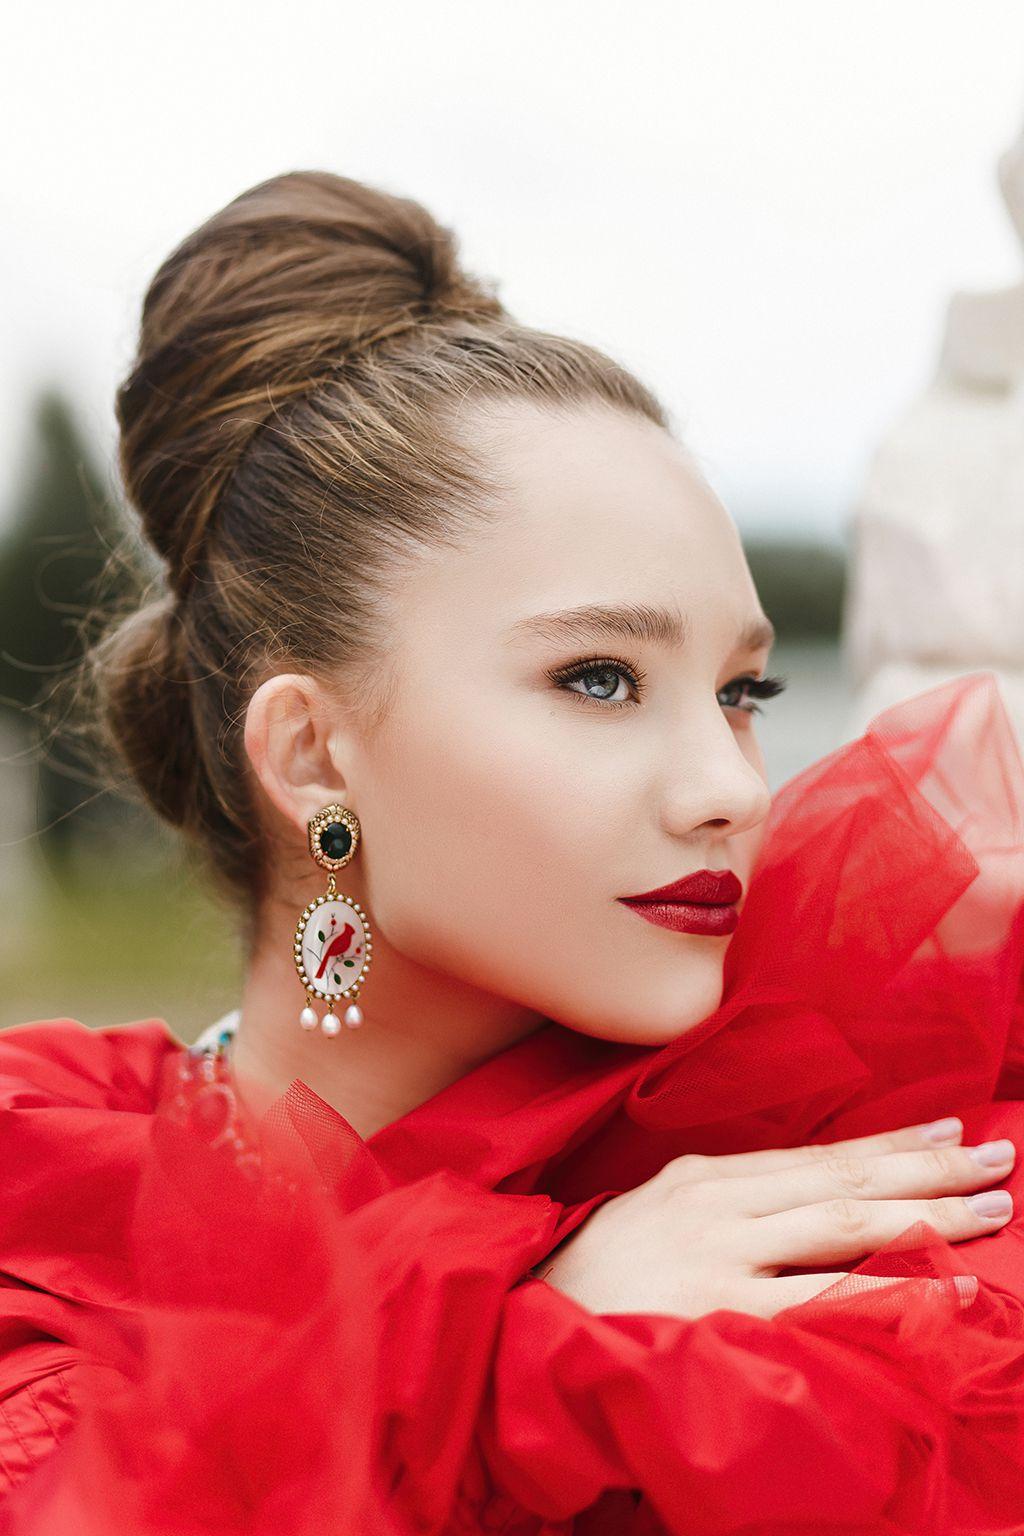 Aleksandra Kiseleva | Queen of roses